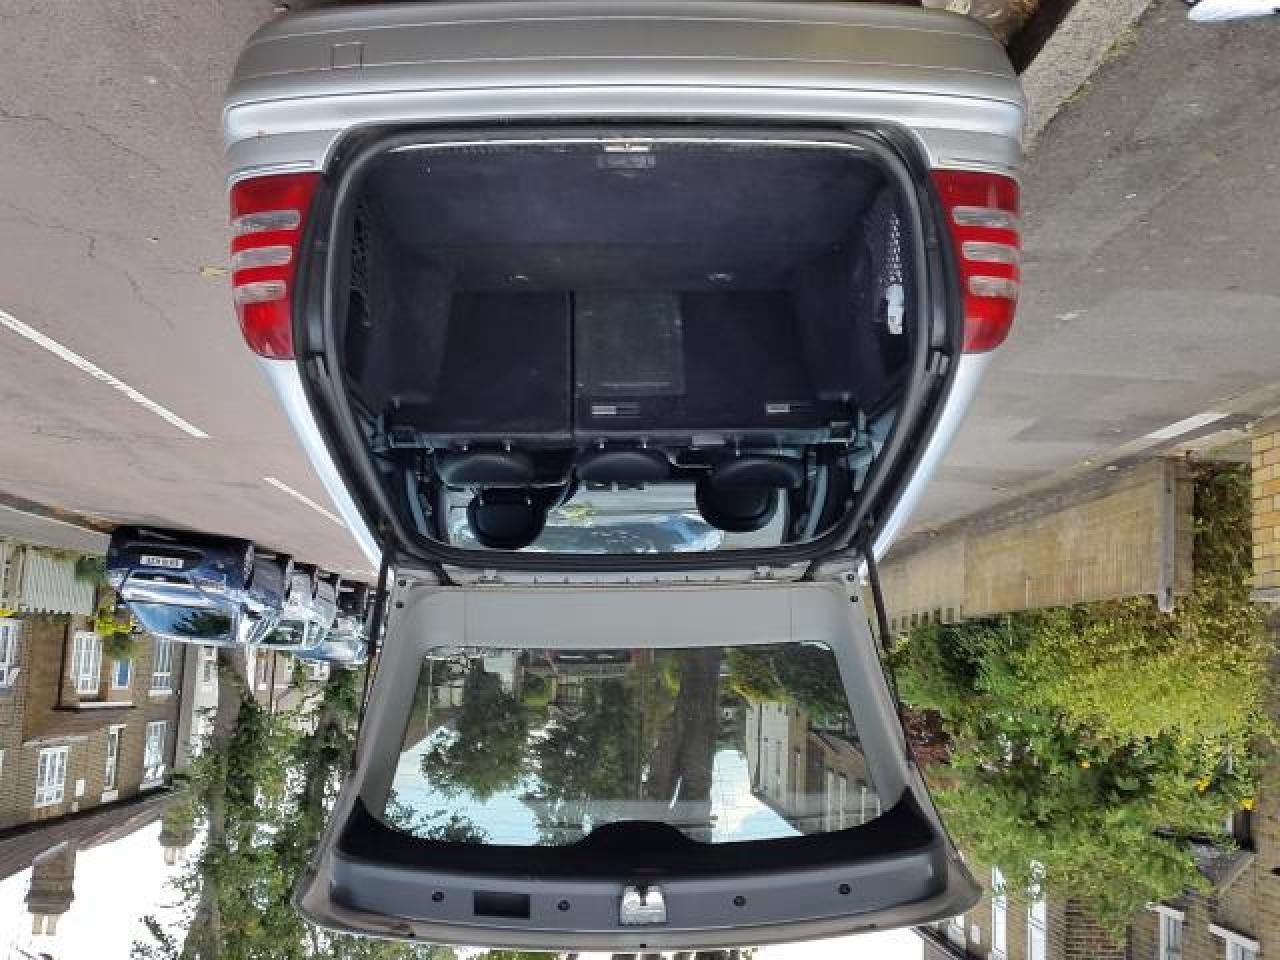 Mercedes C270 Avangarde - 2